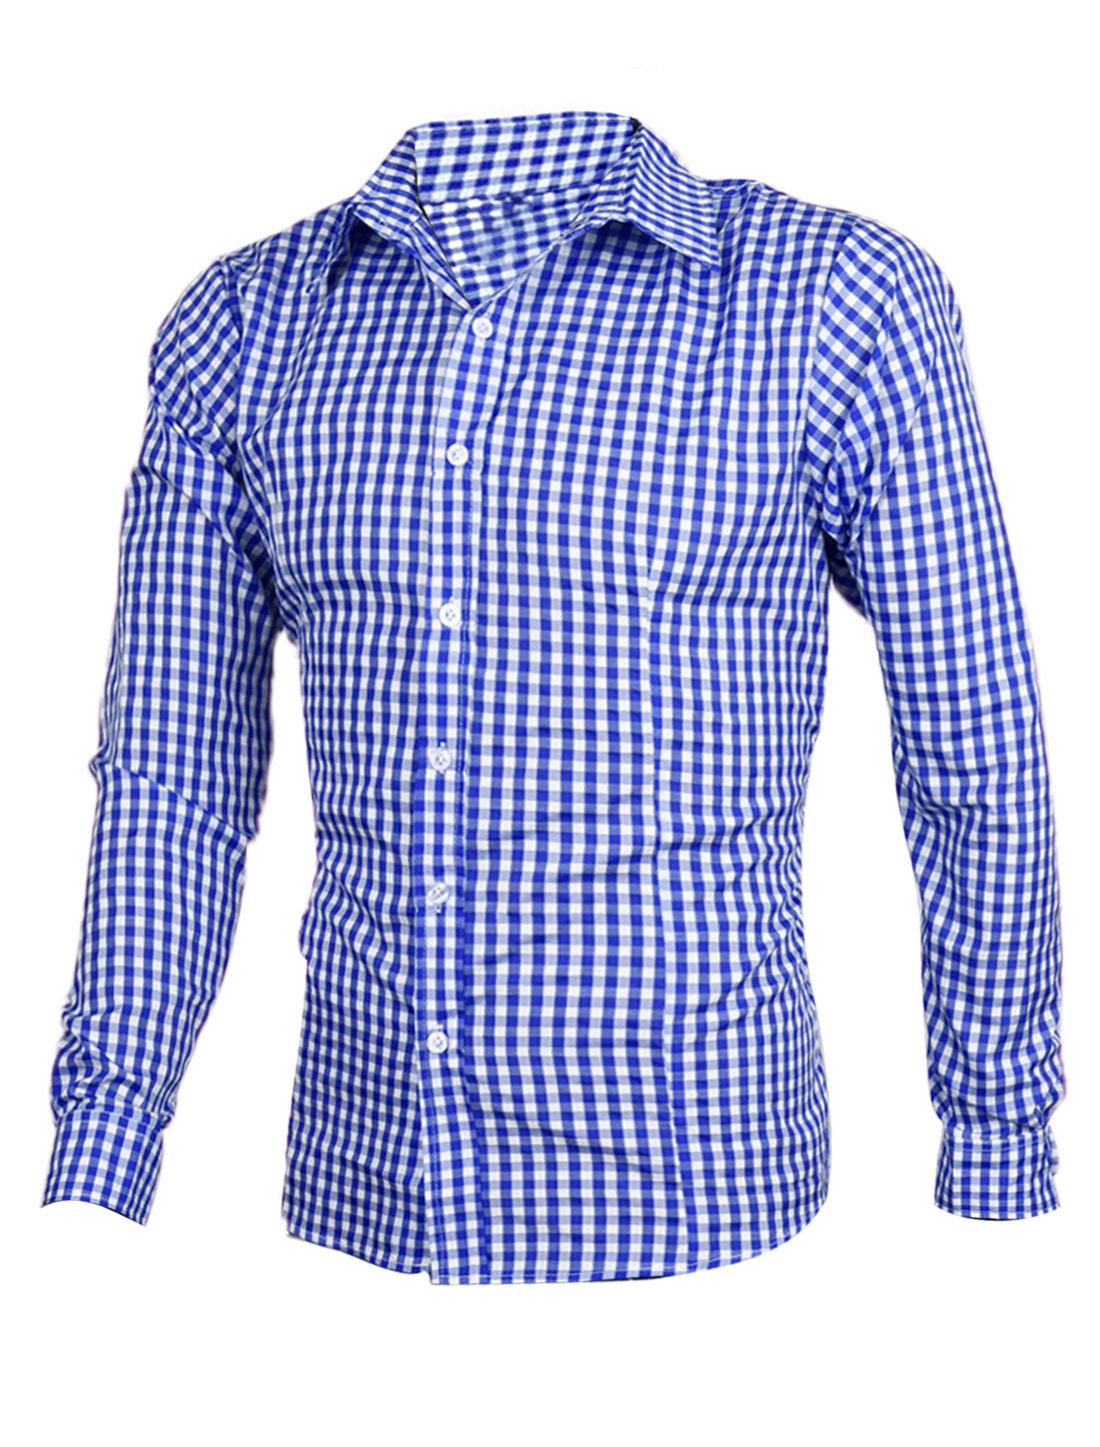 Men Buttoned Cuff Point Collar Plaids Long-sleeved Shirt White Blue M